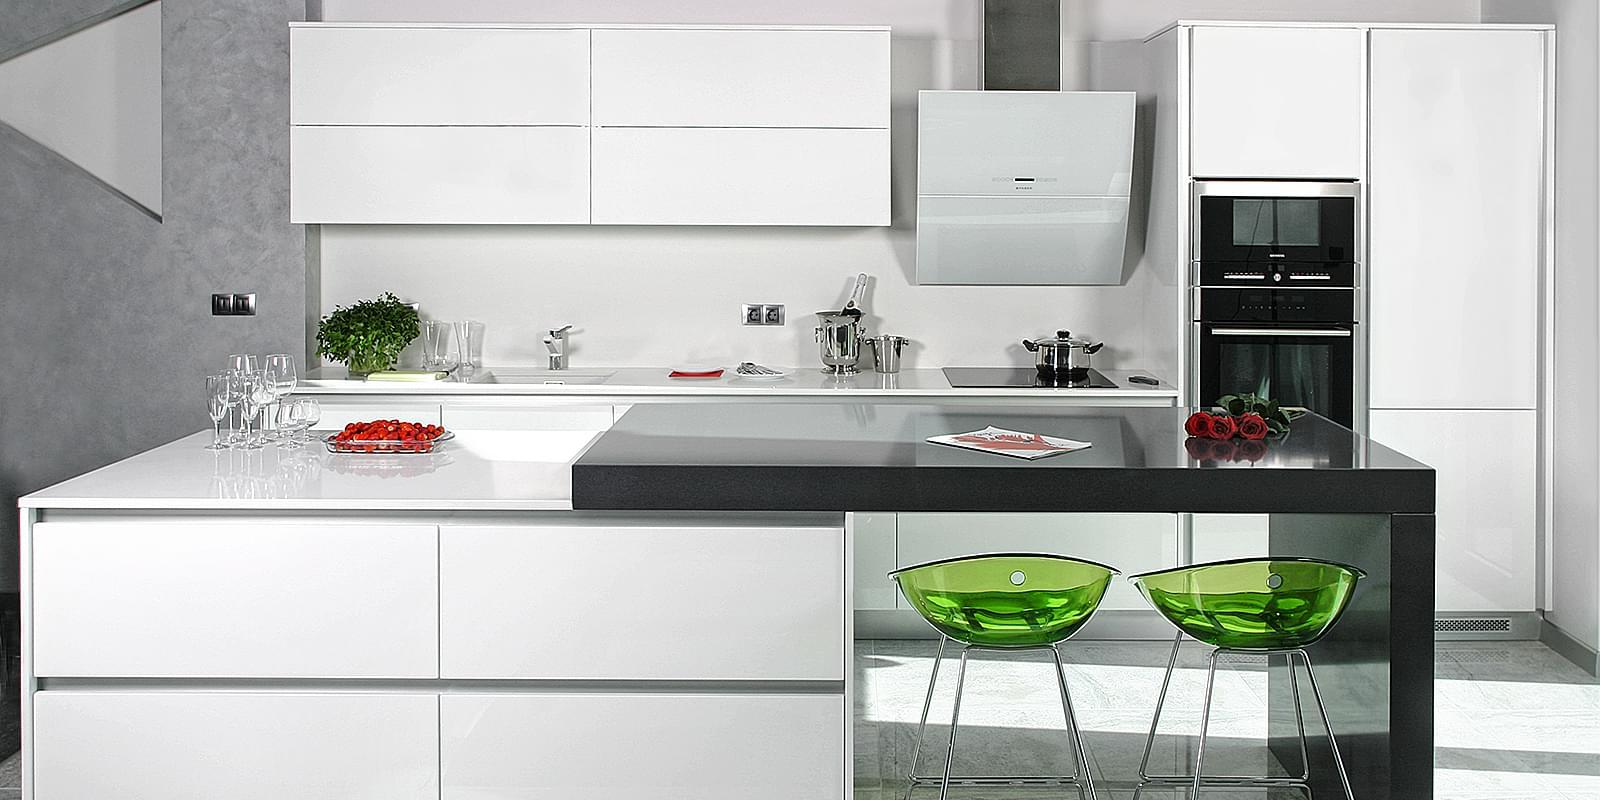 Küchen Dialog - Liviana